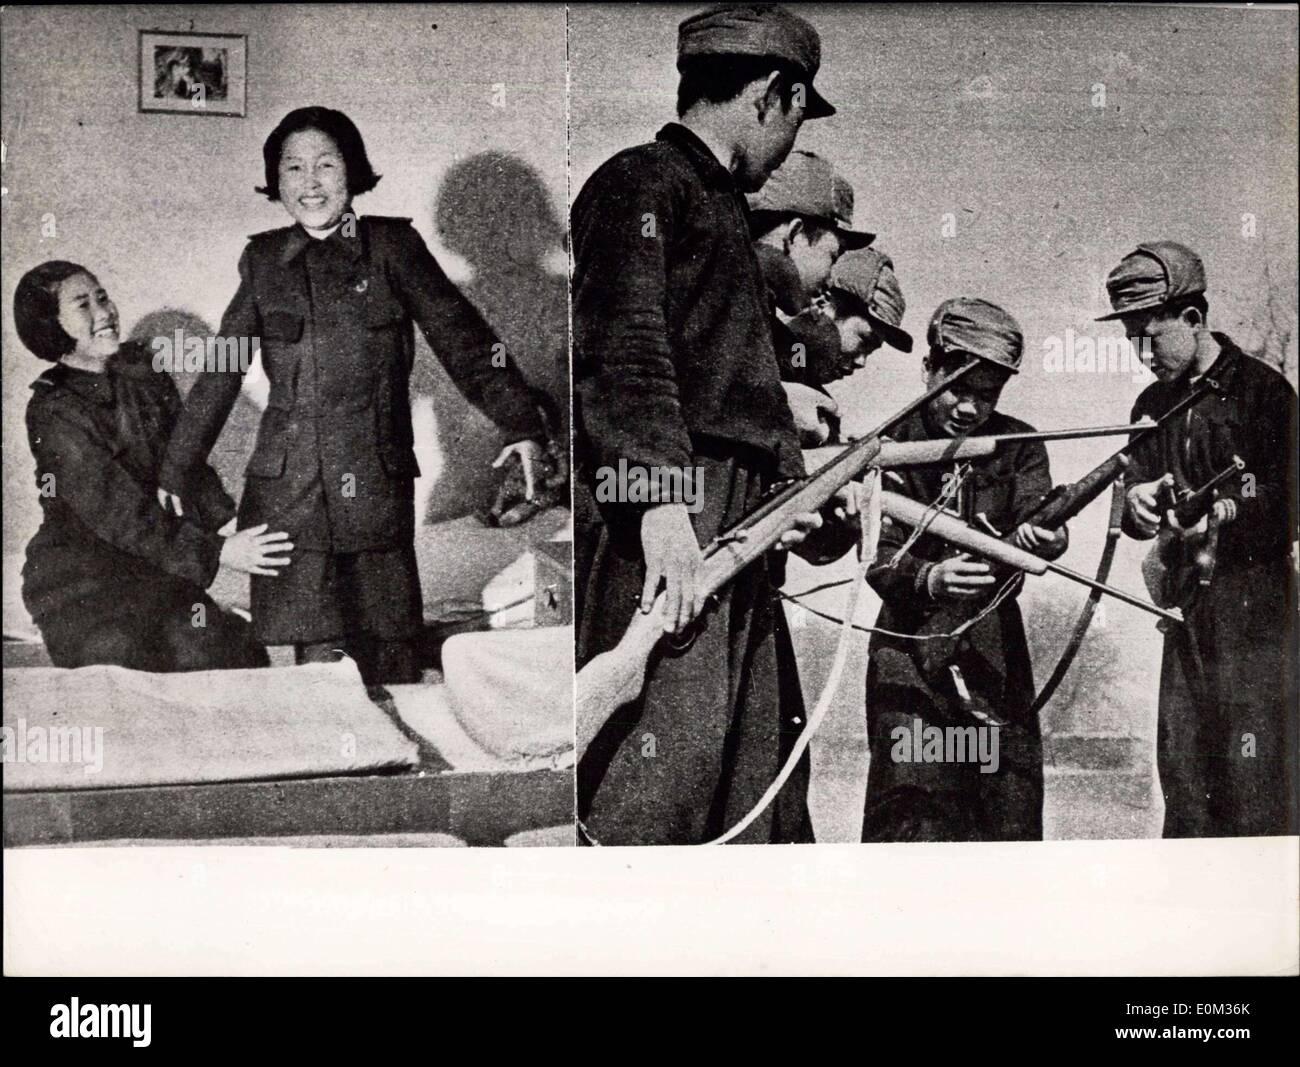 Churchill iron curtain speech cartoon - Iron Curtain Speech For Kids Apr 23 1953 North Korean Children In Eastern Germany As